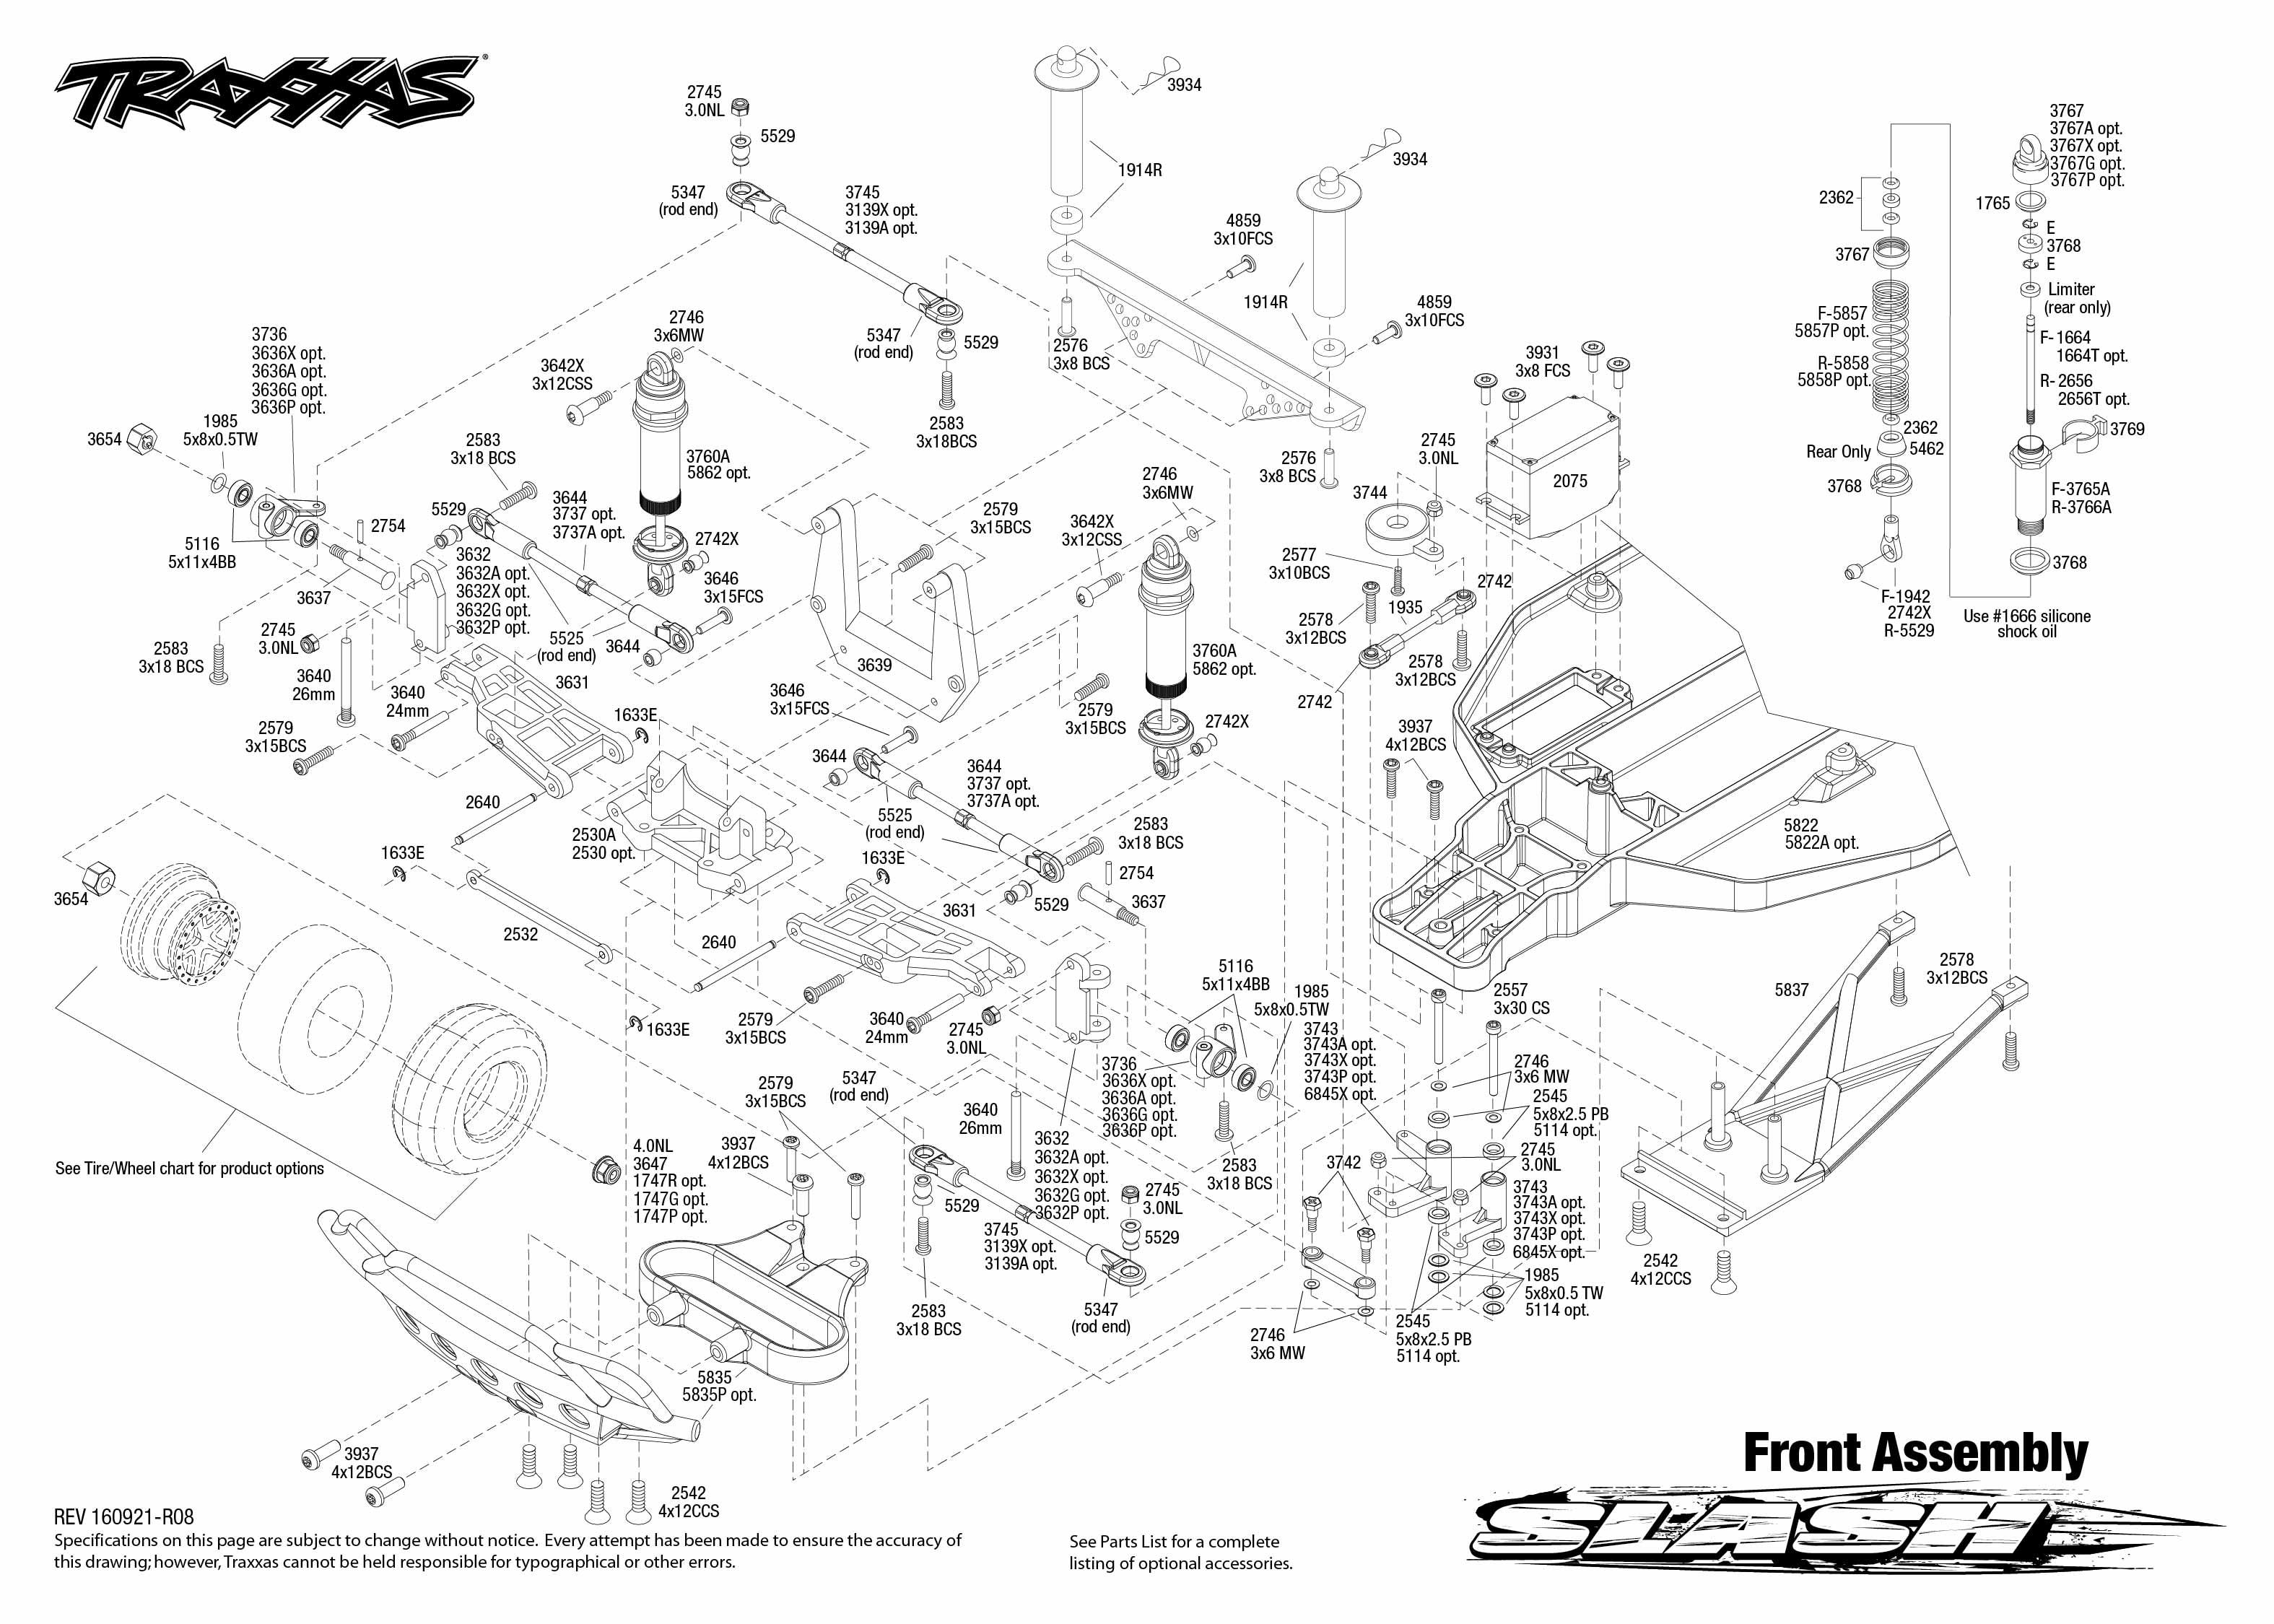 Revo 3 Wiring Diagram Jato 33 Wire Diagrams Of Toyota Traxxas 2 5 Engine Parts Trusted Slash